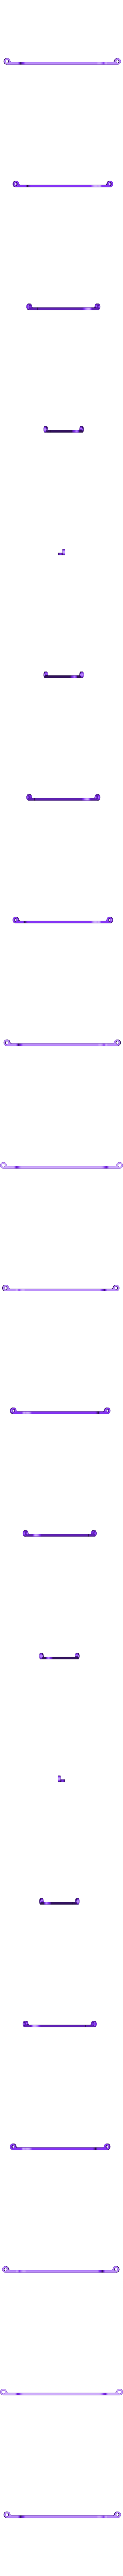 22-LONG-STR.stl Download STL file Ratrod Pickup • 3D printing template, macone1